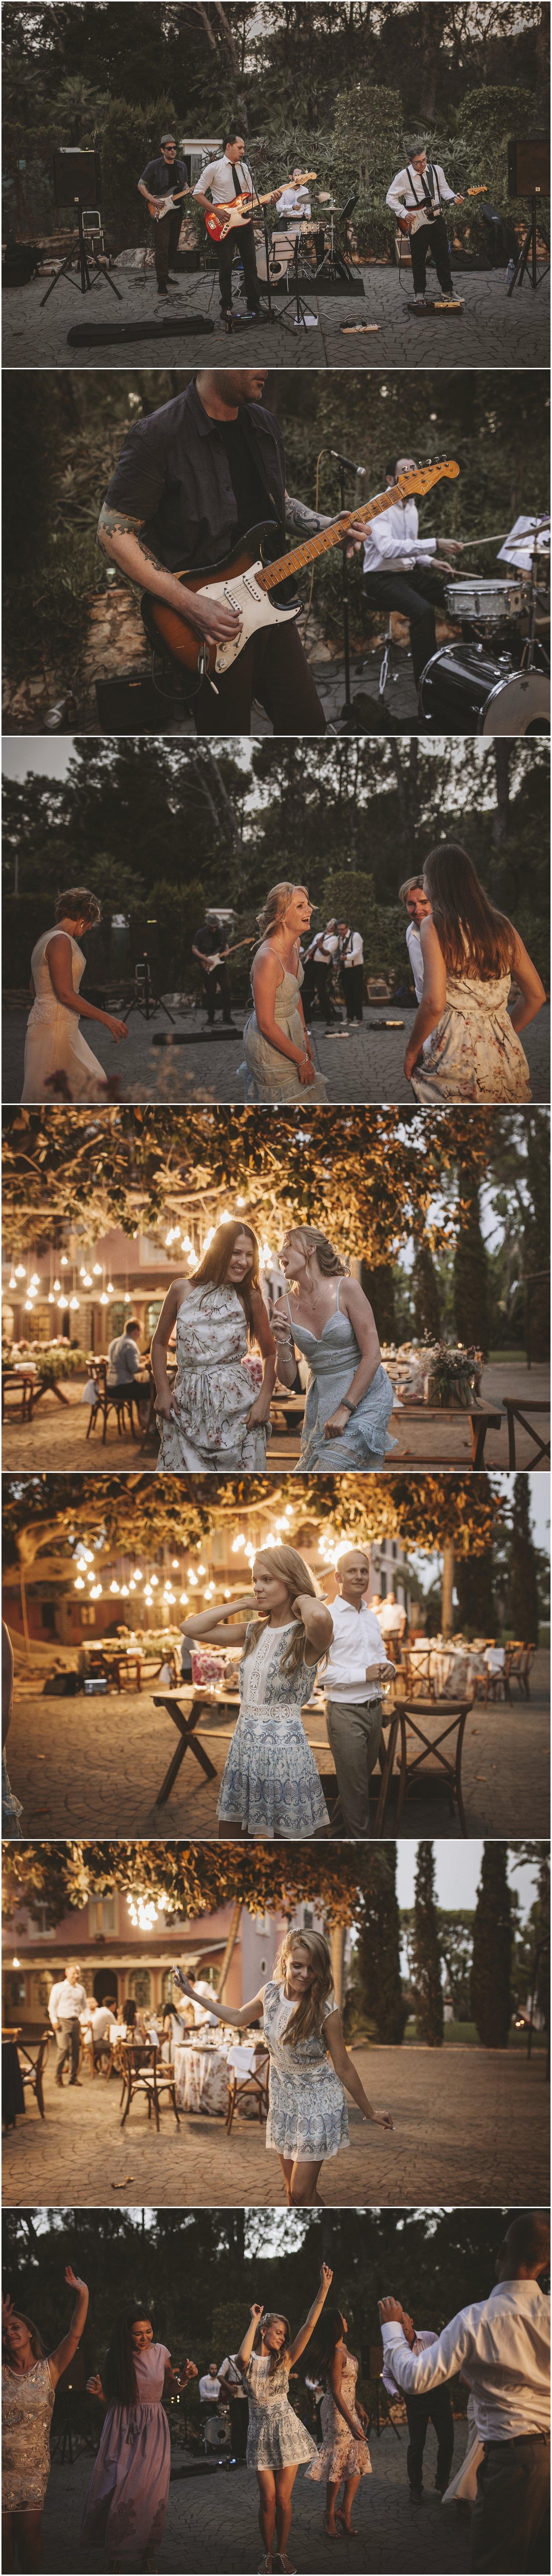 Russian wedding Spain, Russian wedding in Alicante,Barcelona,Marbella,Benidorm,Altea,fotografo de boda, wedding photographer, Oscar Guillen